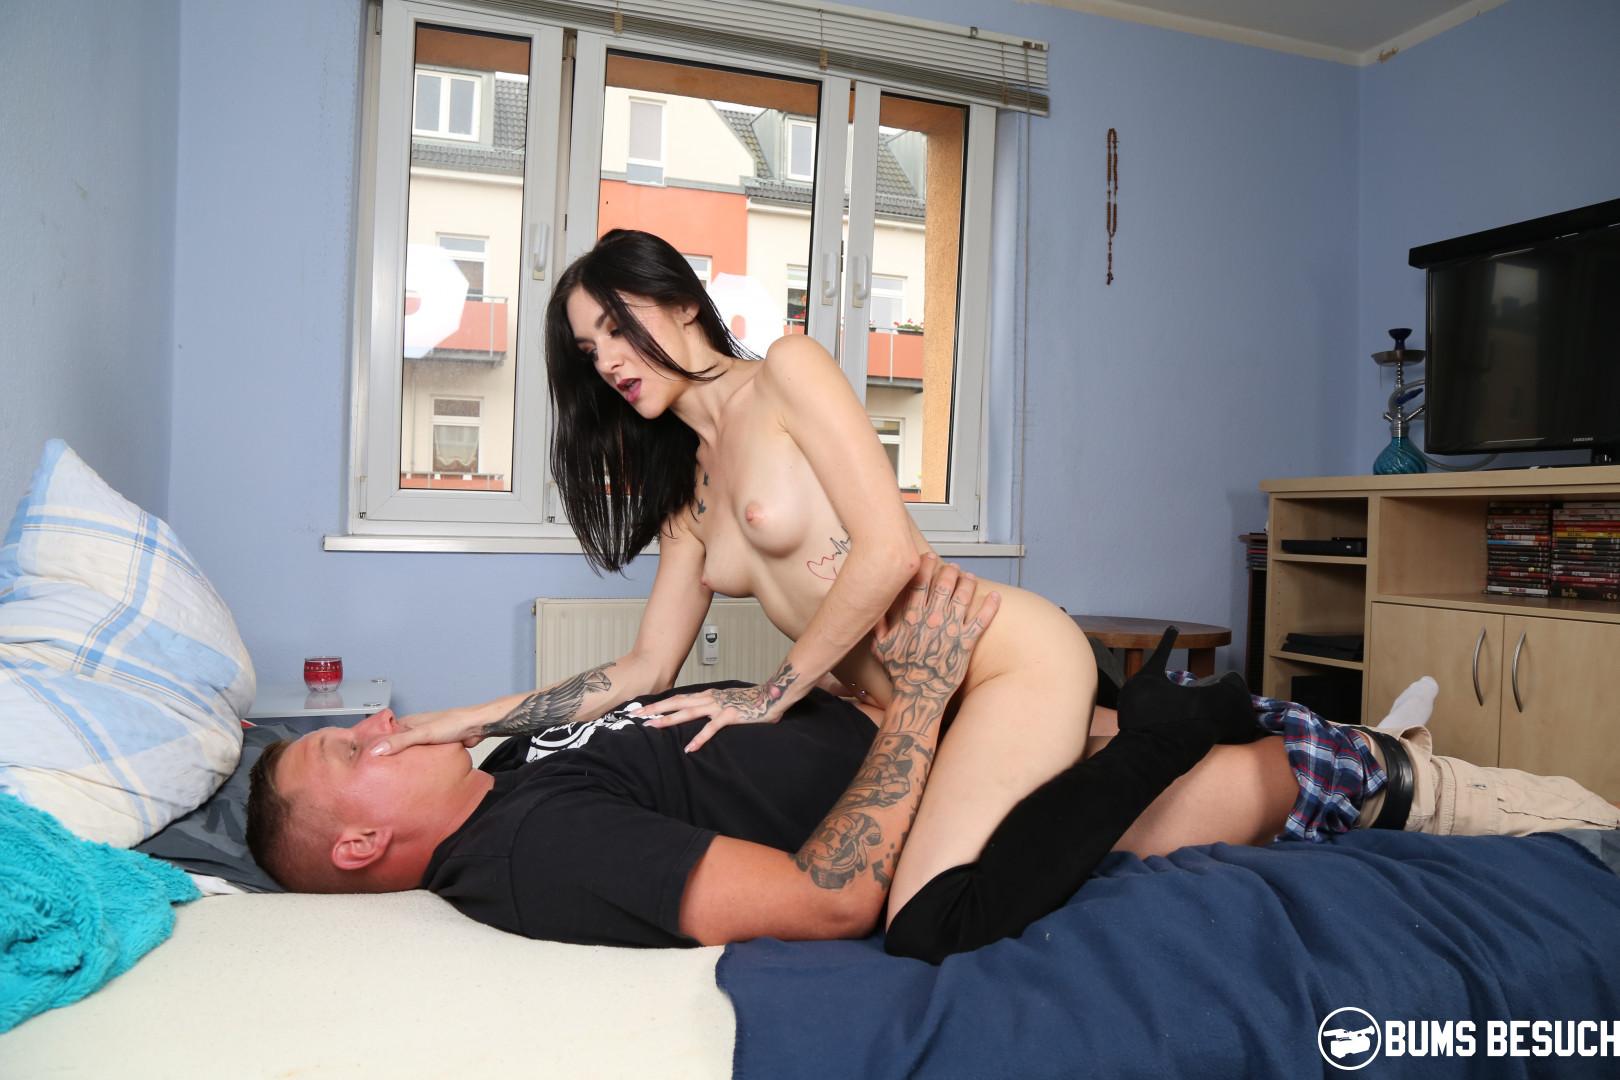 Sexy amateur brunette porn star